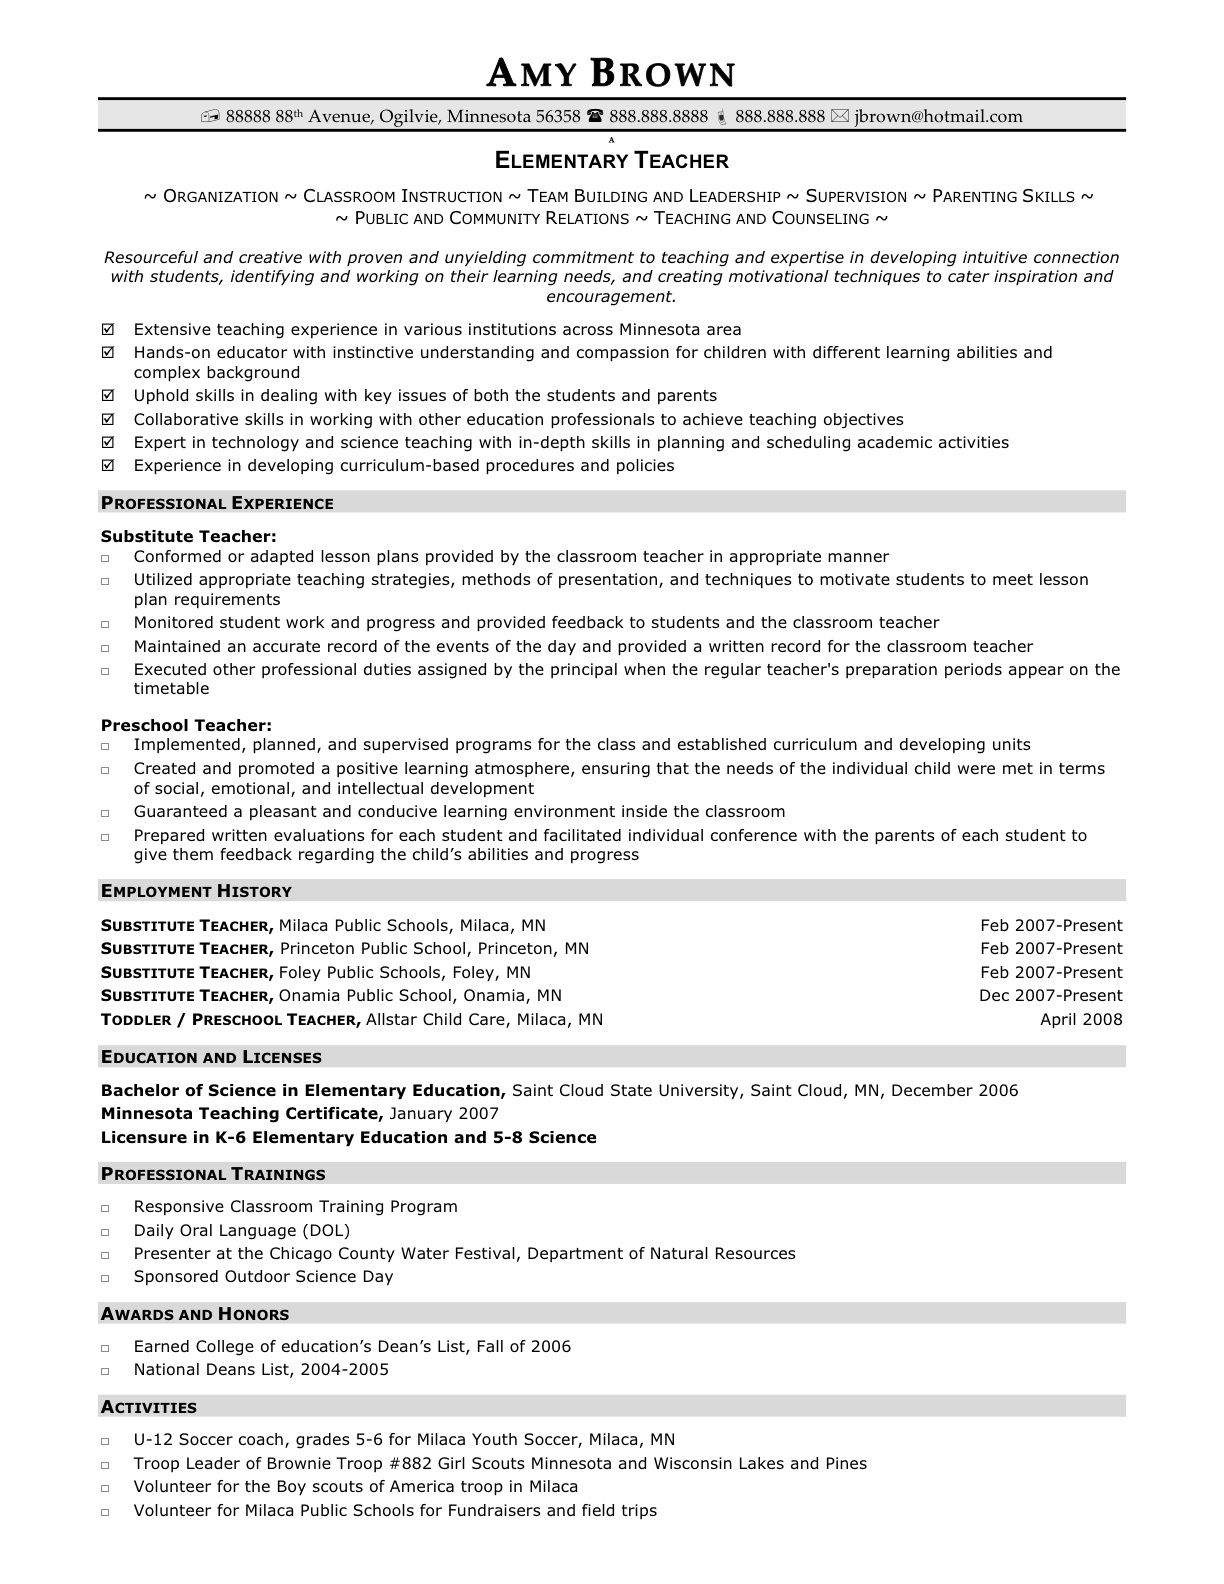 elementary teacher resume skills list